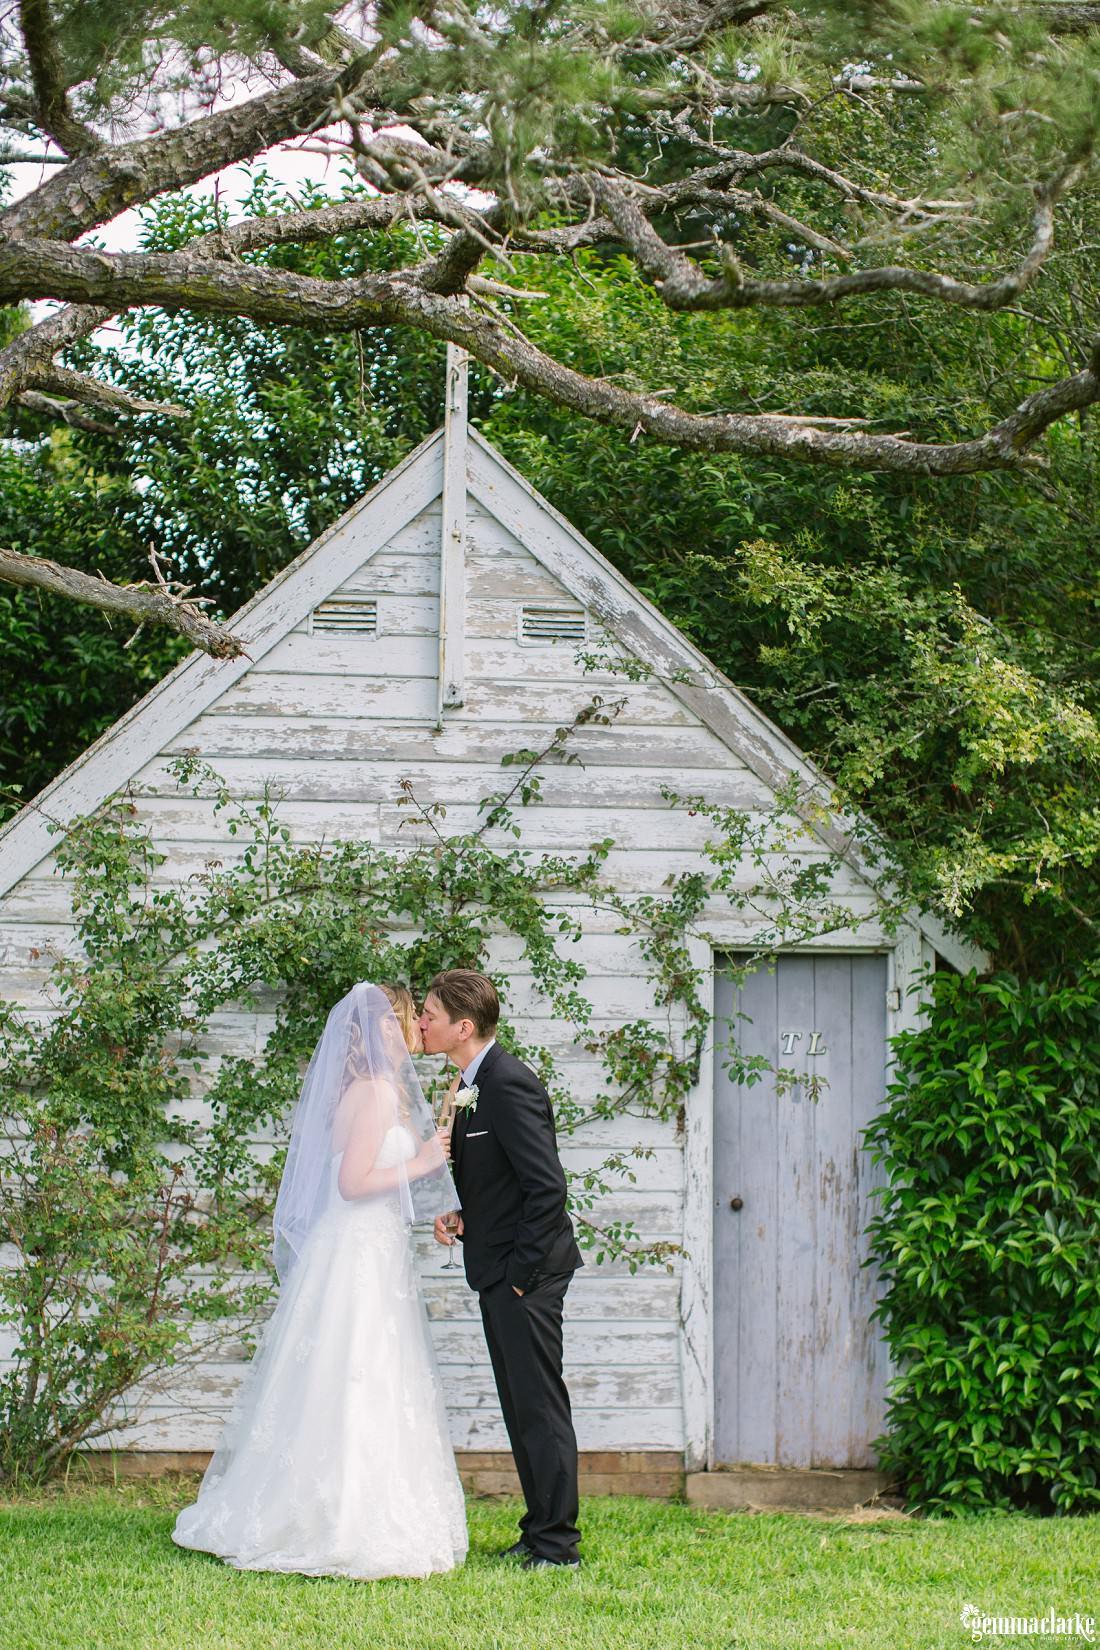 gemma-clarke-photography_summerlees-wedding_southern-highlands-wedding_erin-and-alistair_0050